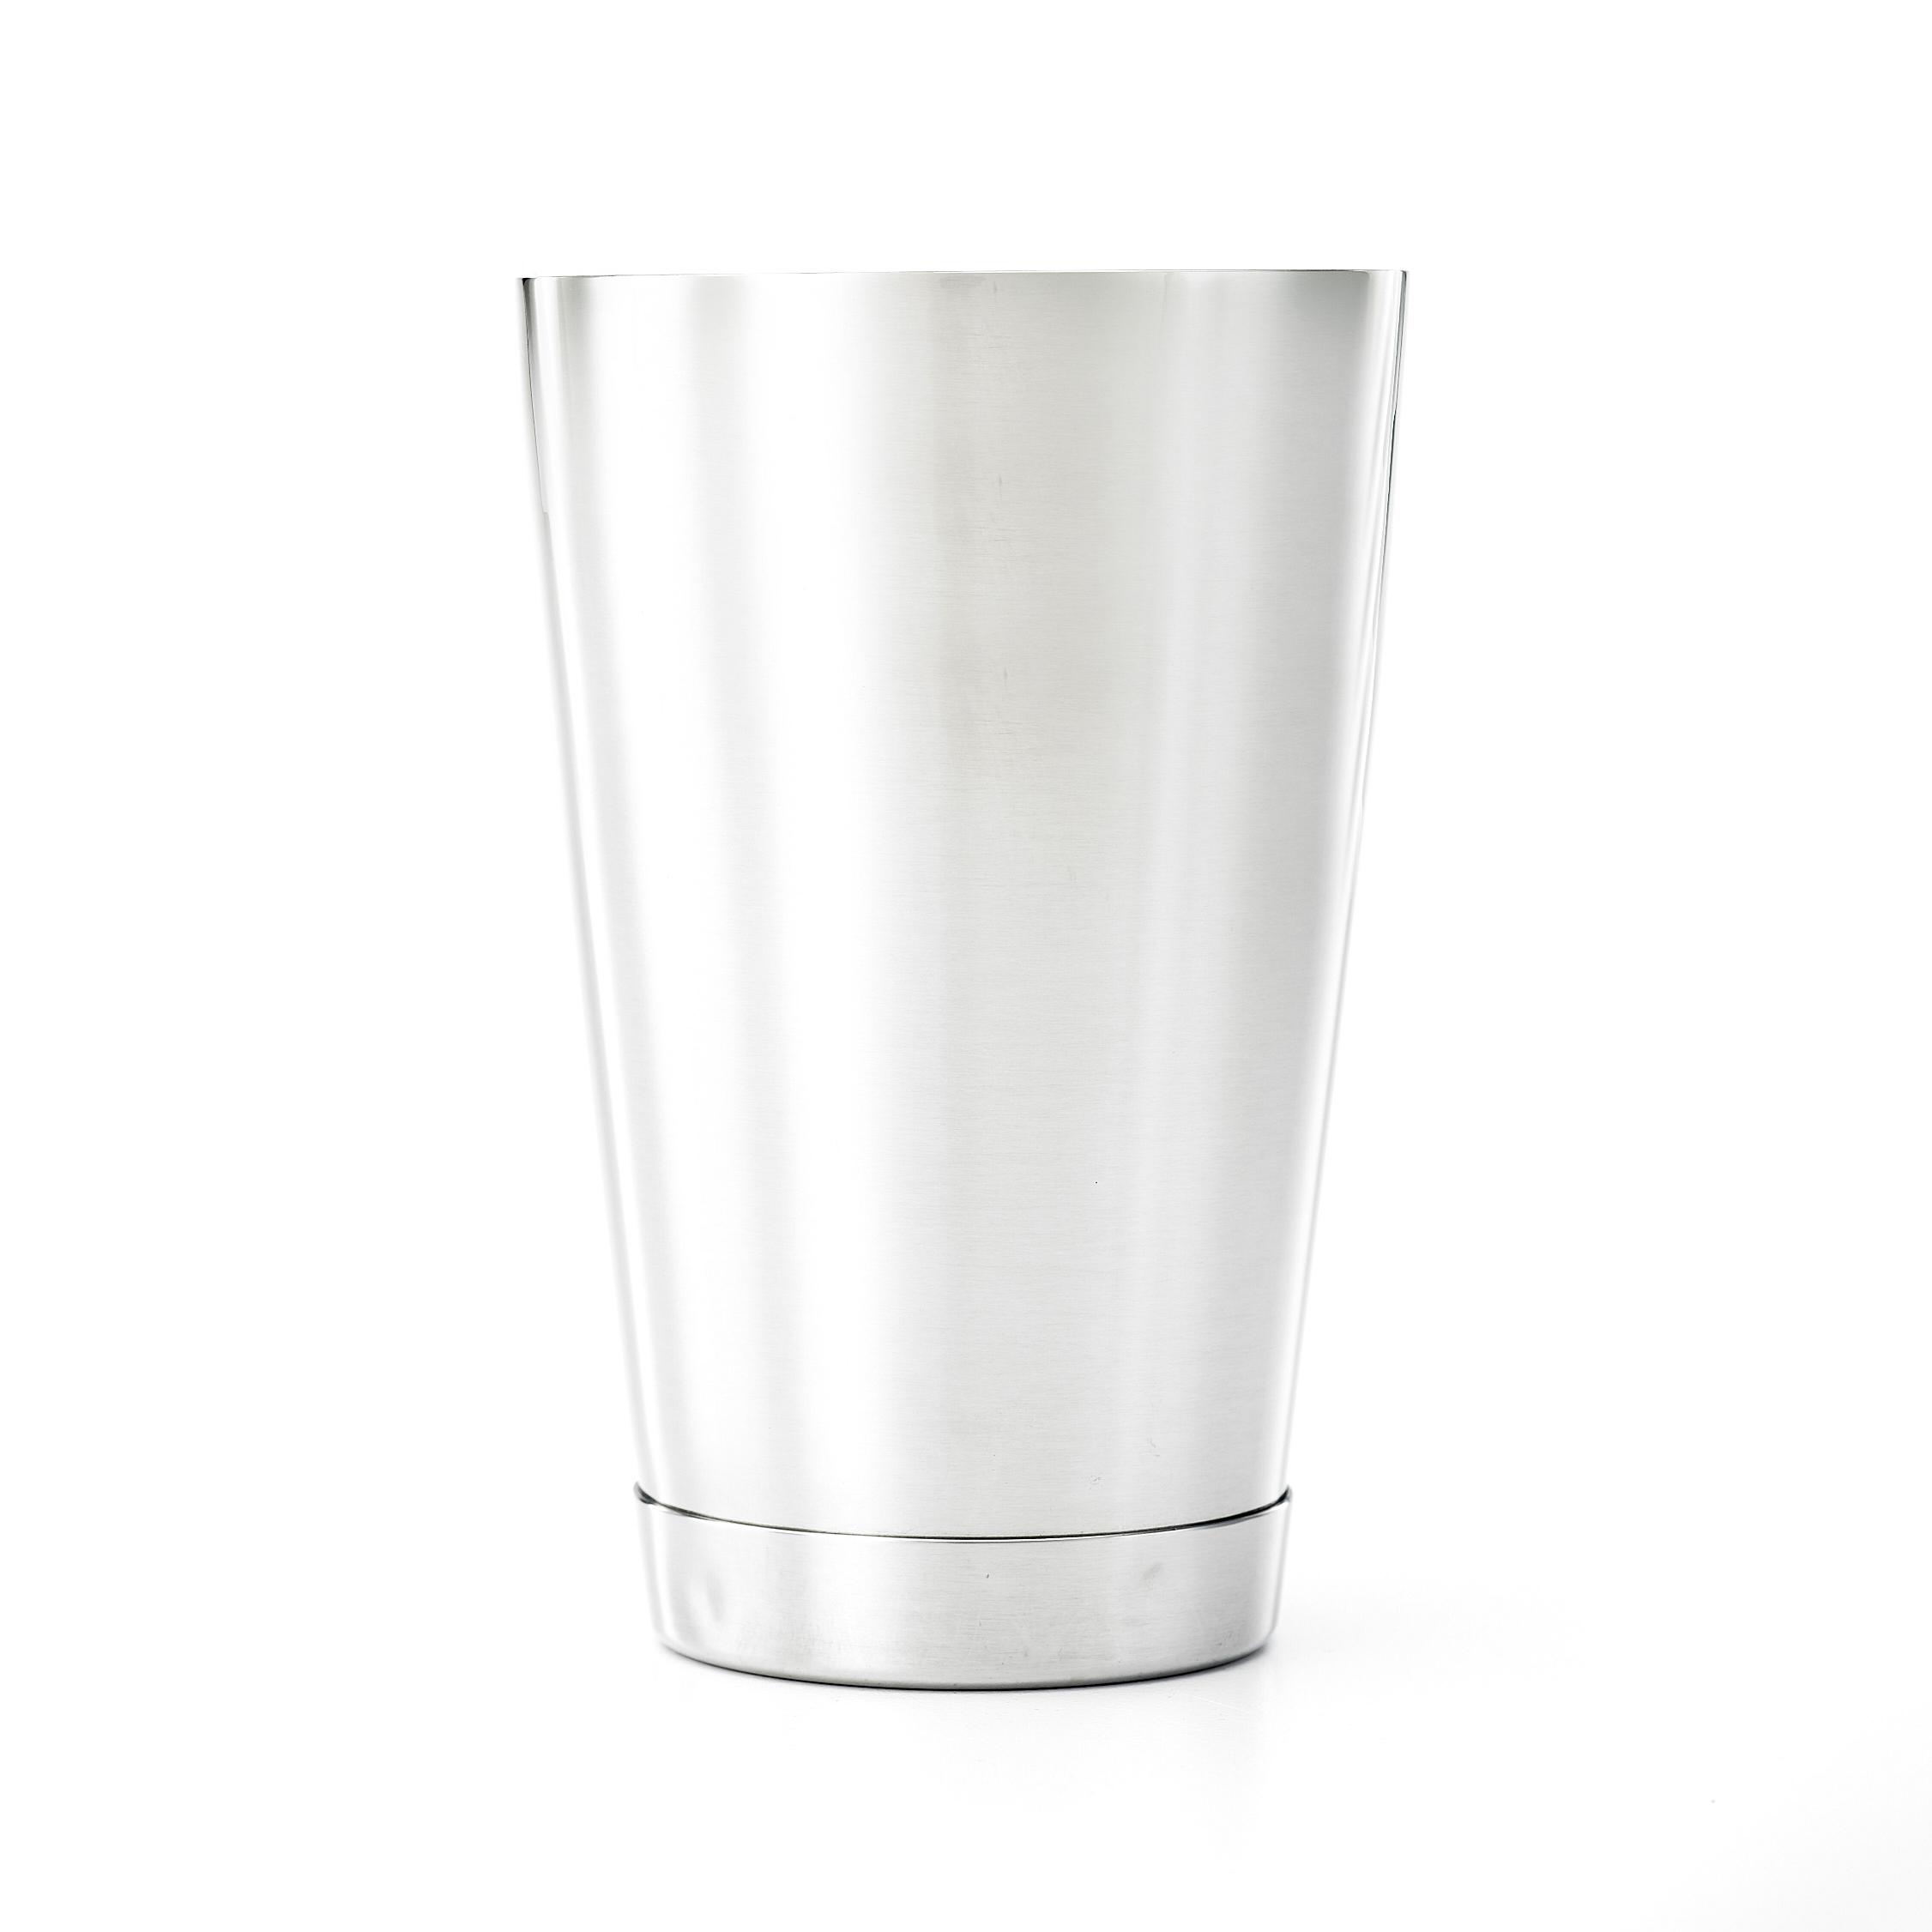 Mercer Culinary M37080 bar cocktail shaker